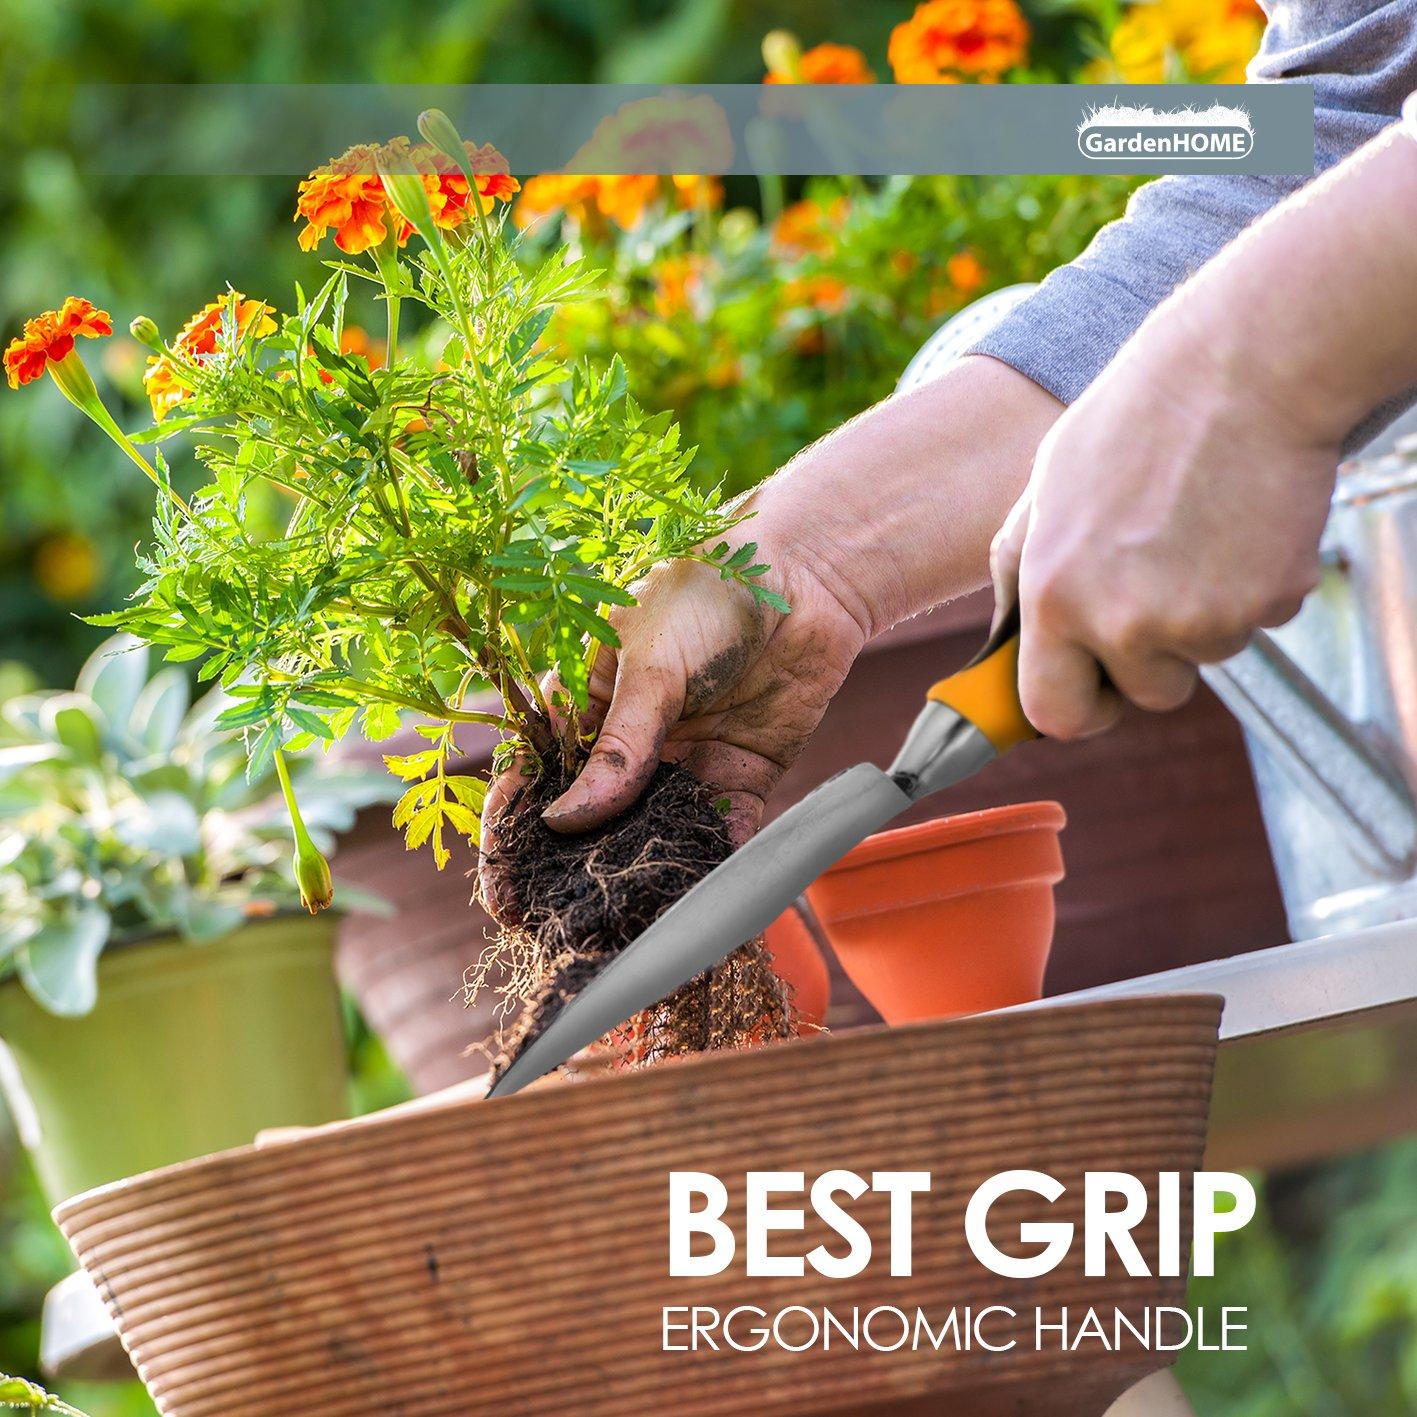 GardenHOME 8 Piece Garden Tool Set - 5 Heavy Duty Cast-Aluminium Tools with Ergonomic Handles, Handy Garden Storage Bag, a Pruner and a Roll of Plant Twist Ties by GardenHOME (Image #5)